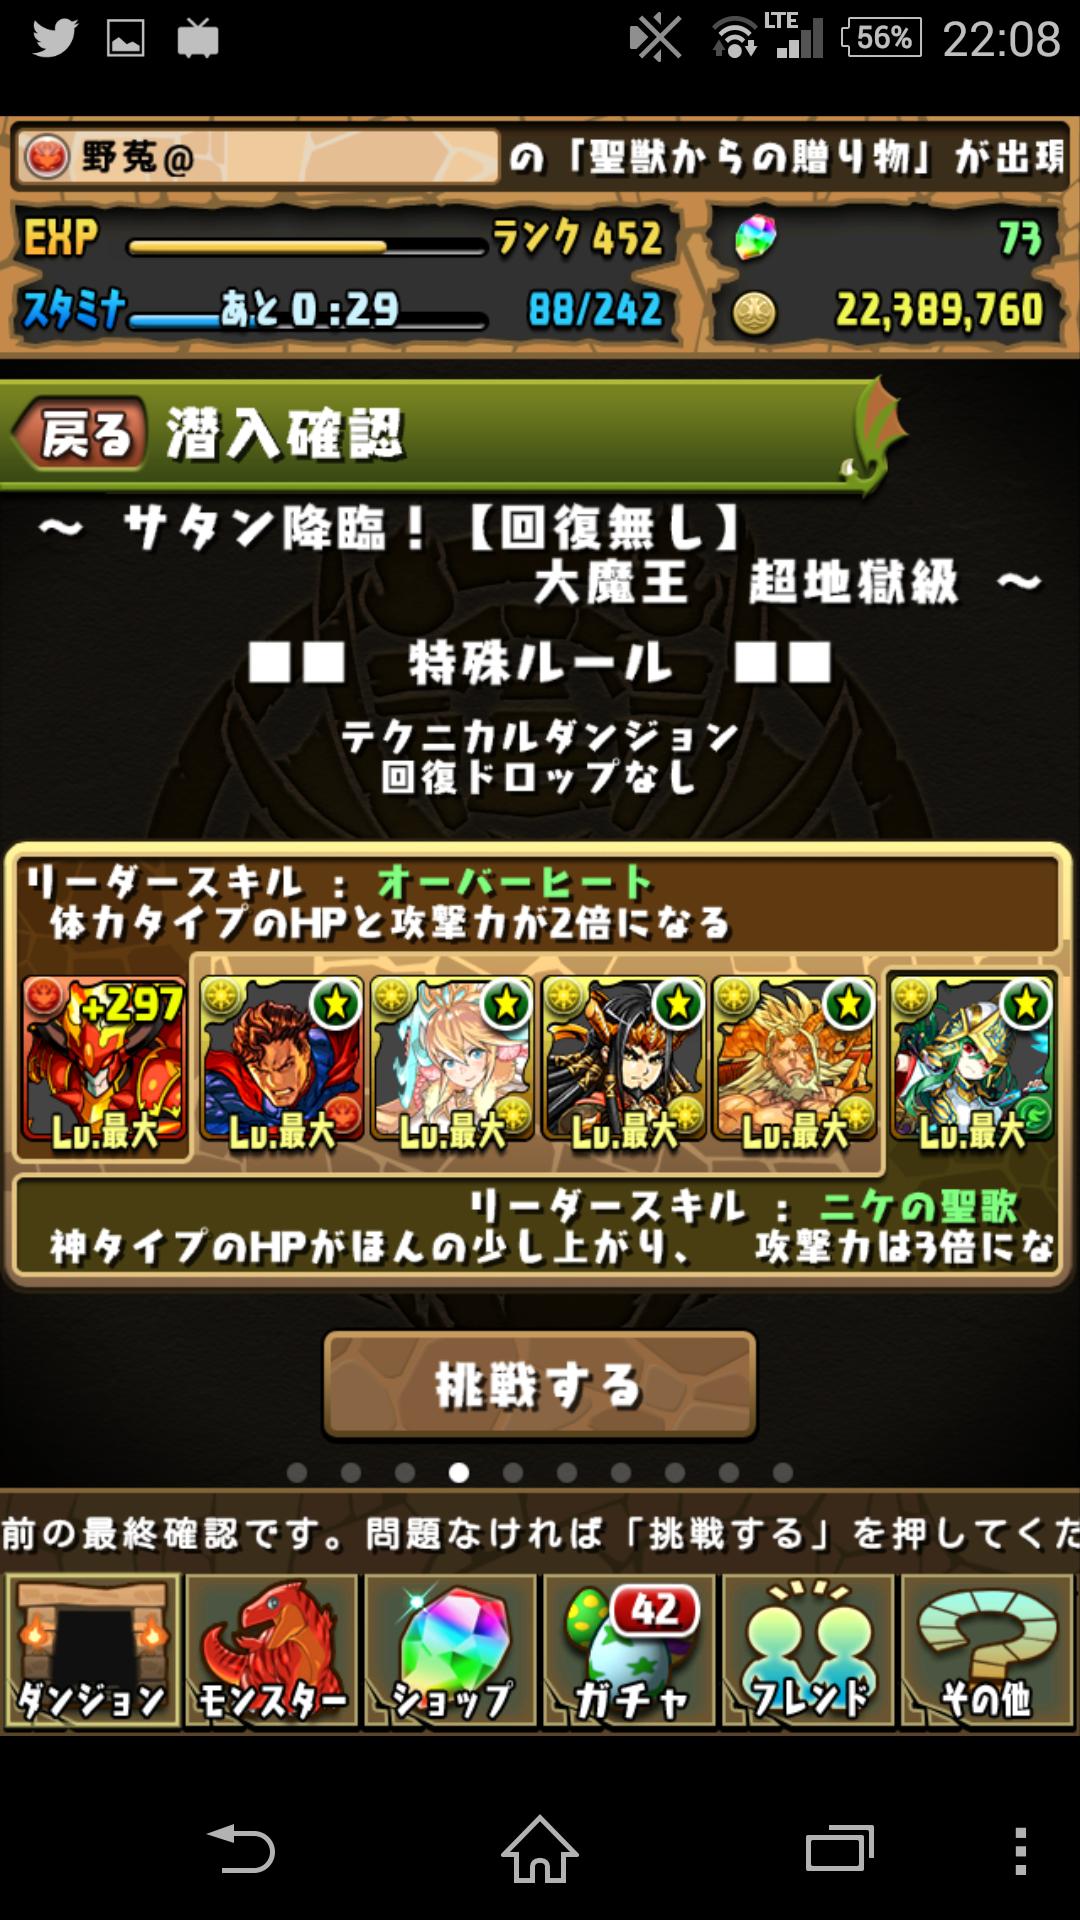 Screenshot_2015-01-24-22-08-50.png